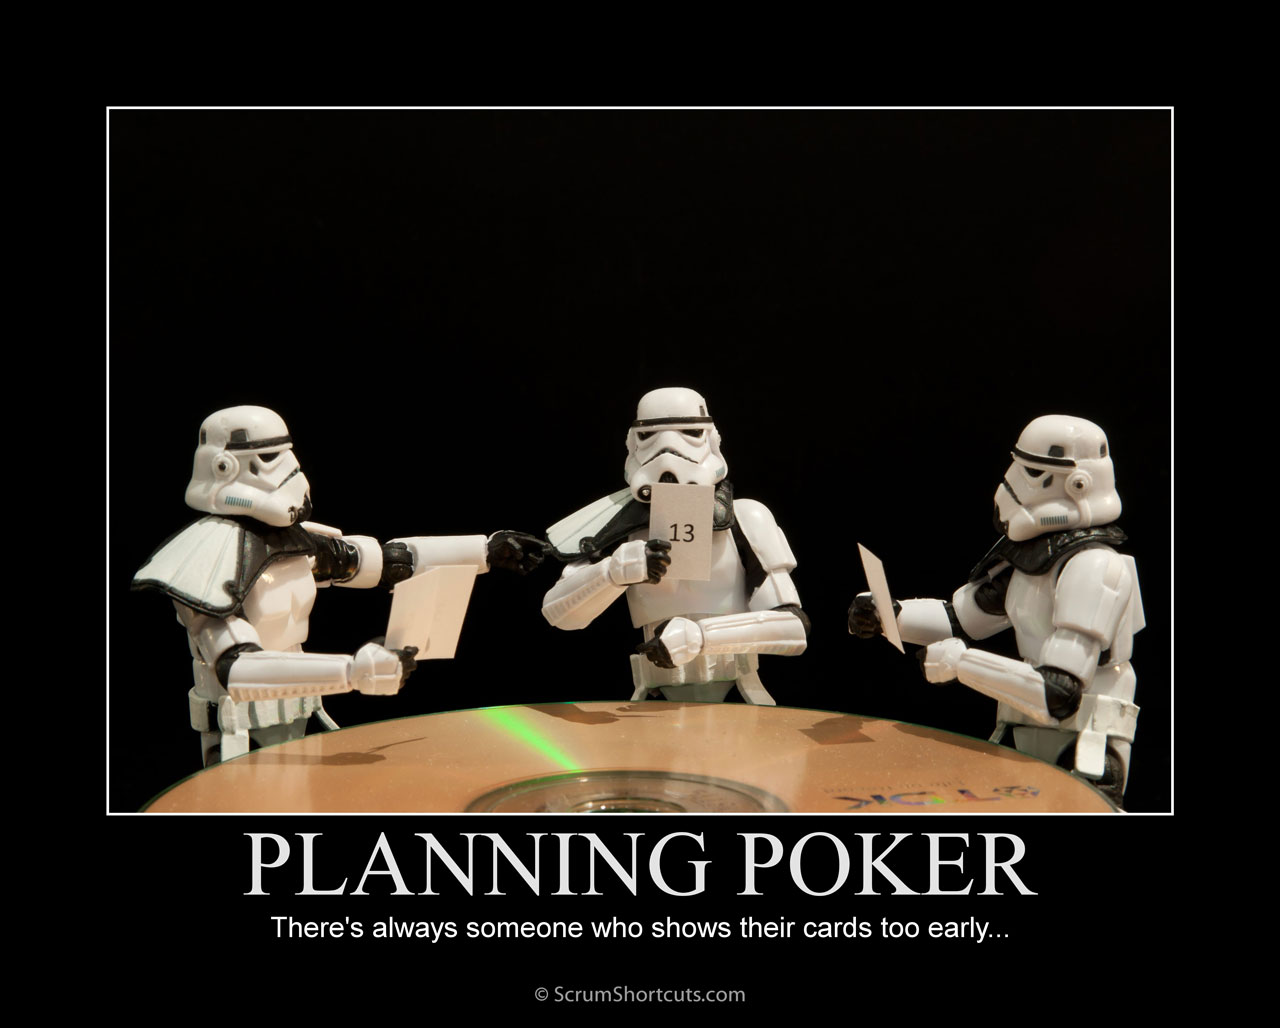 Sprint poker planning cards